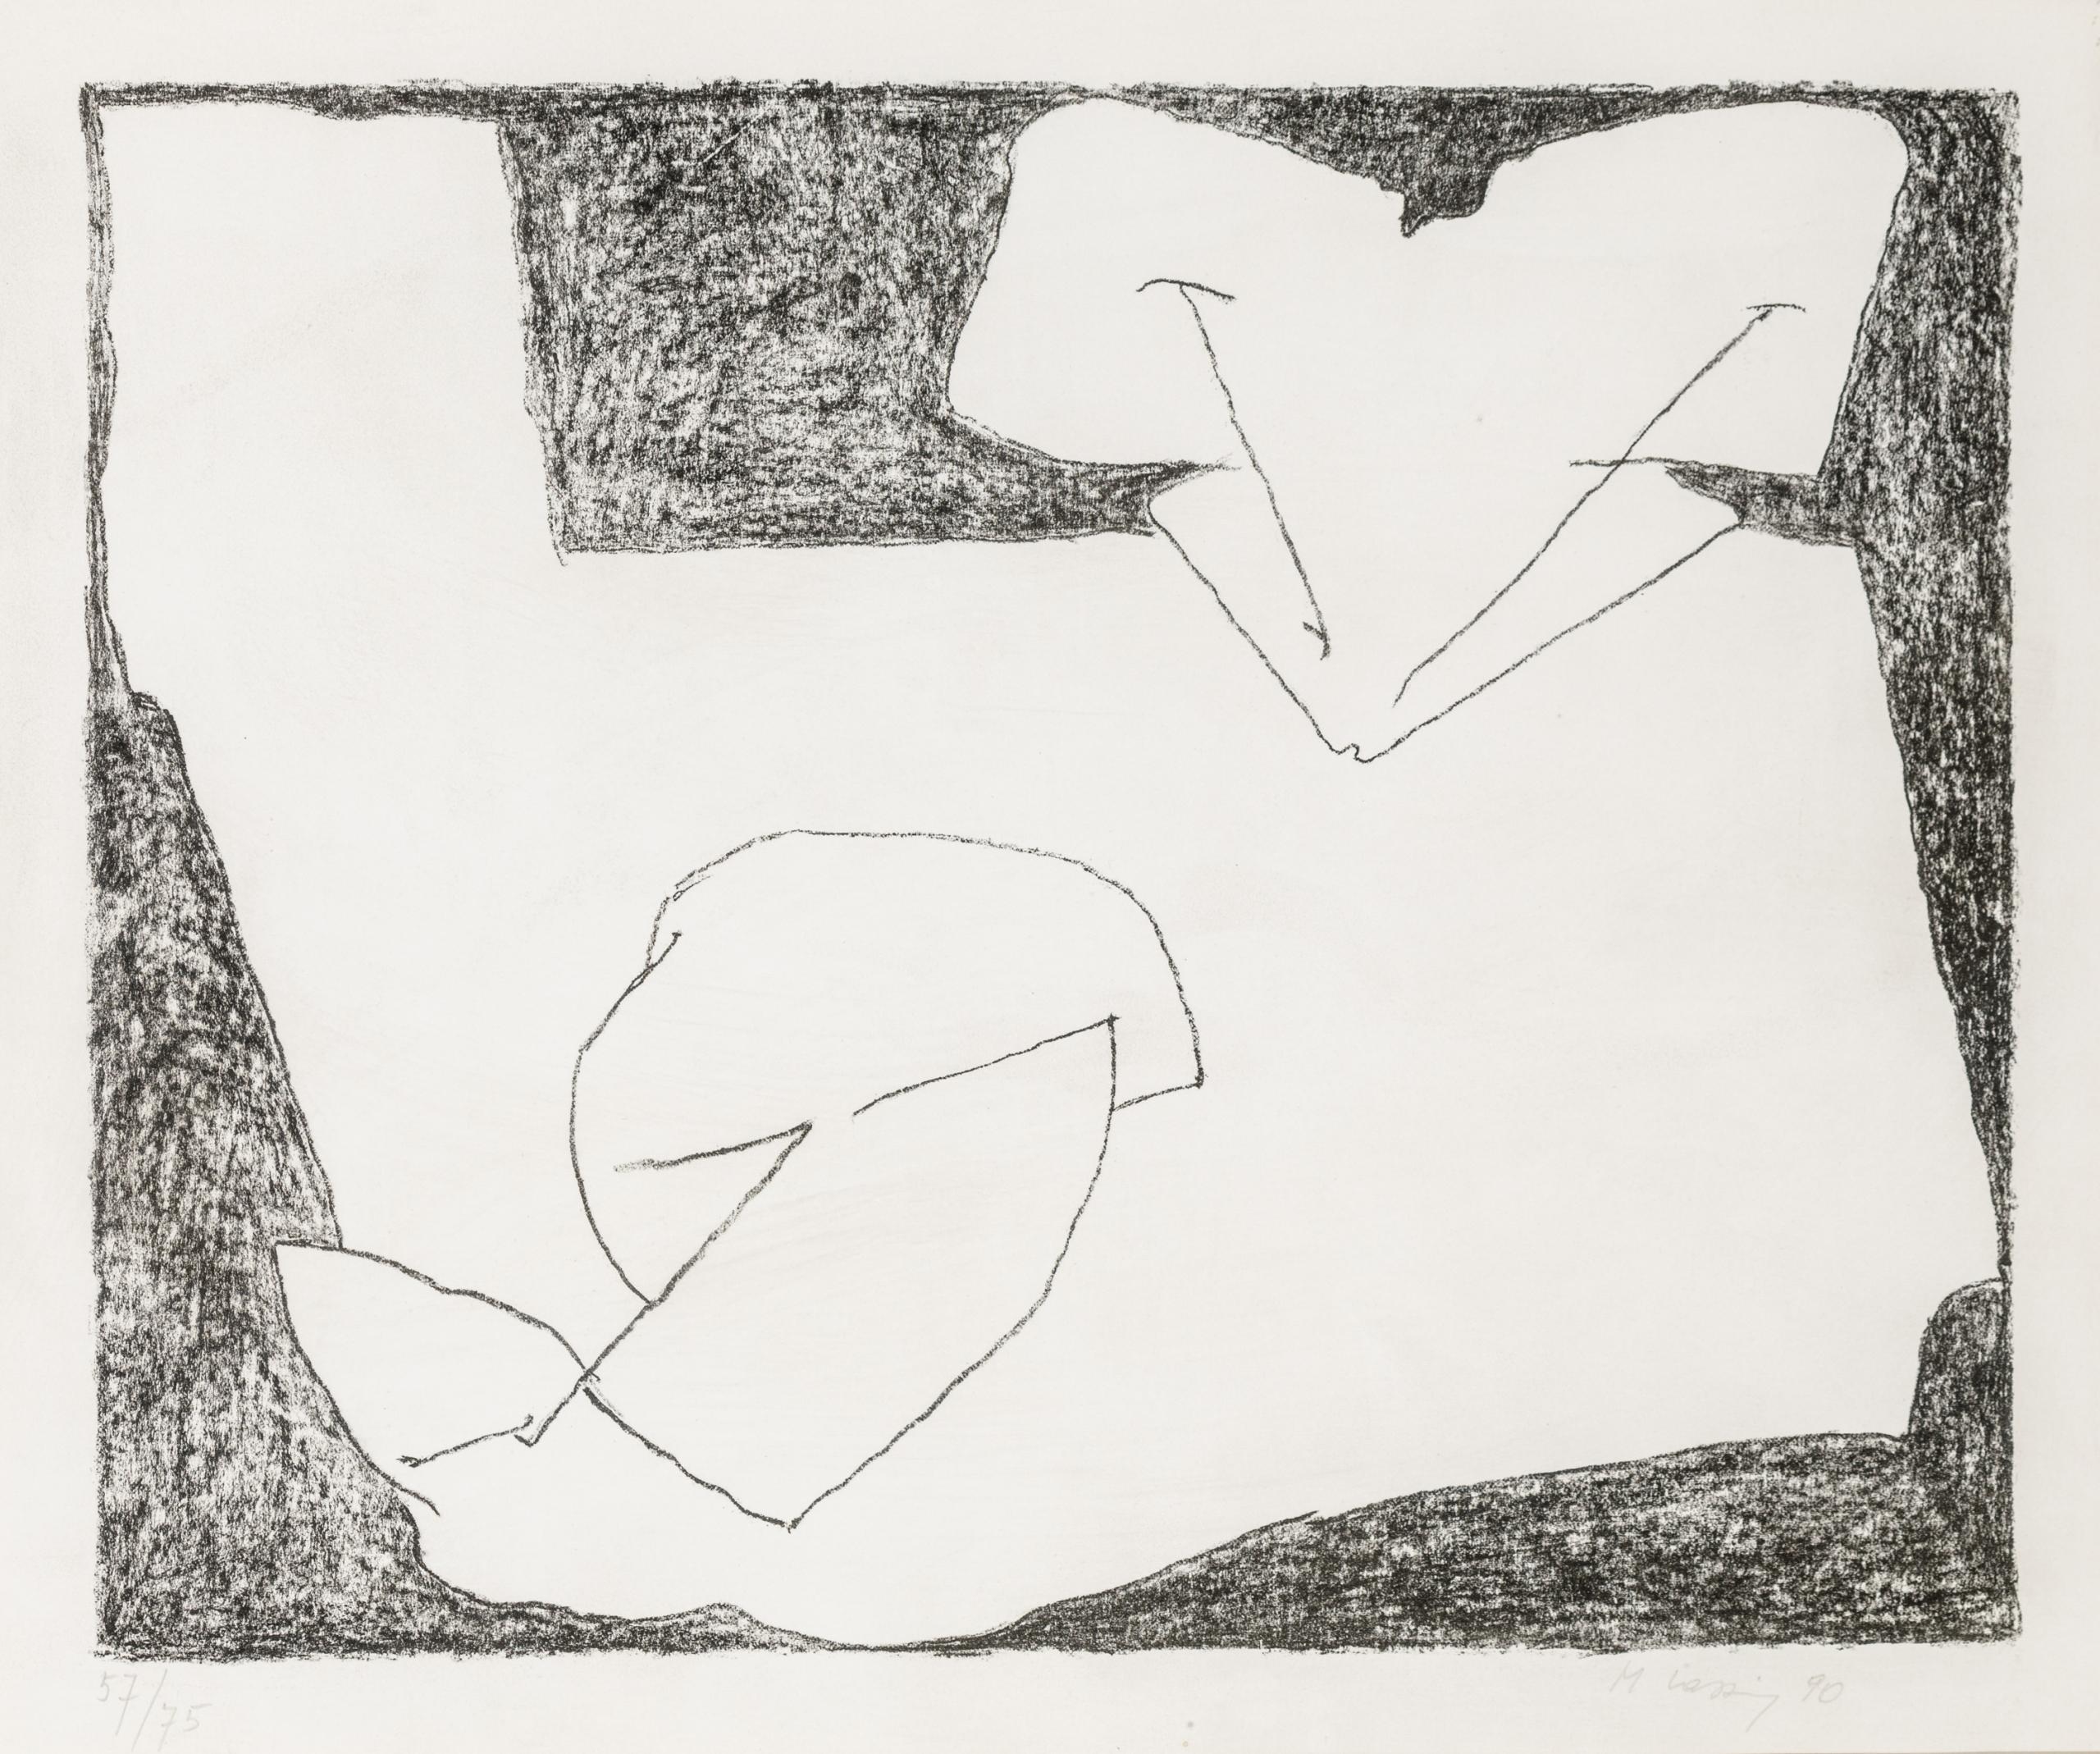 Maria Lassnig, Ohne Titel / untitled